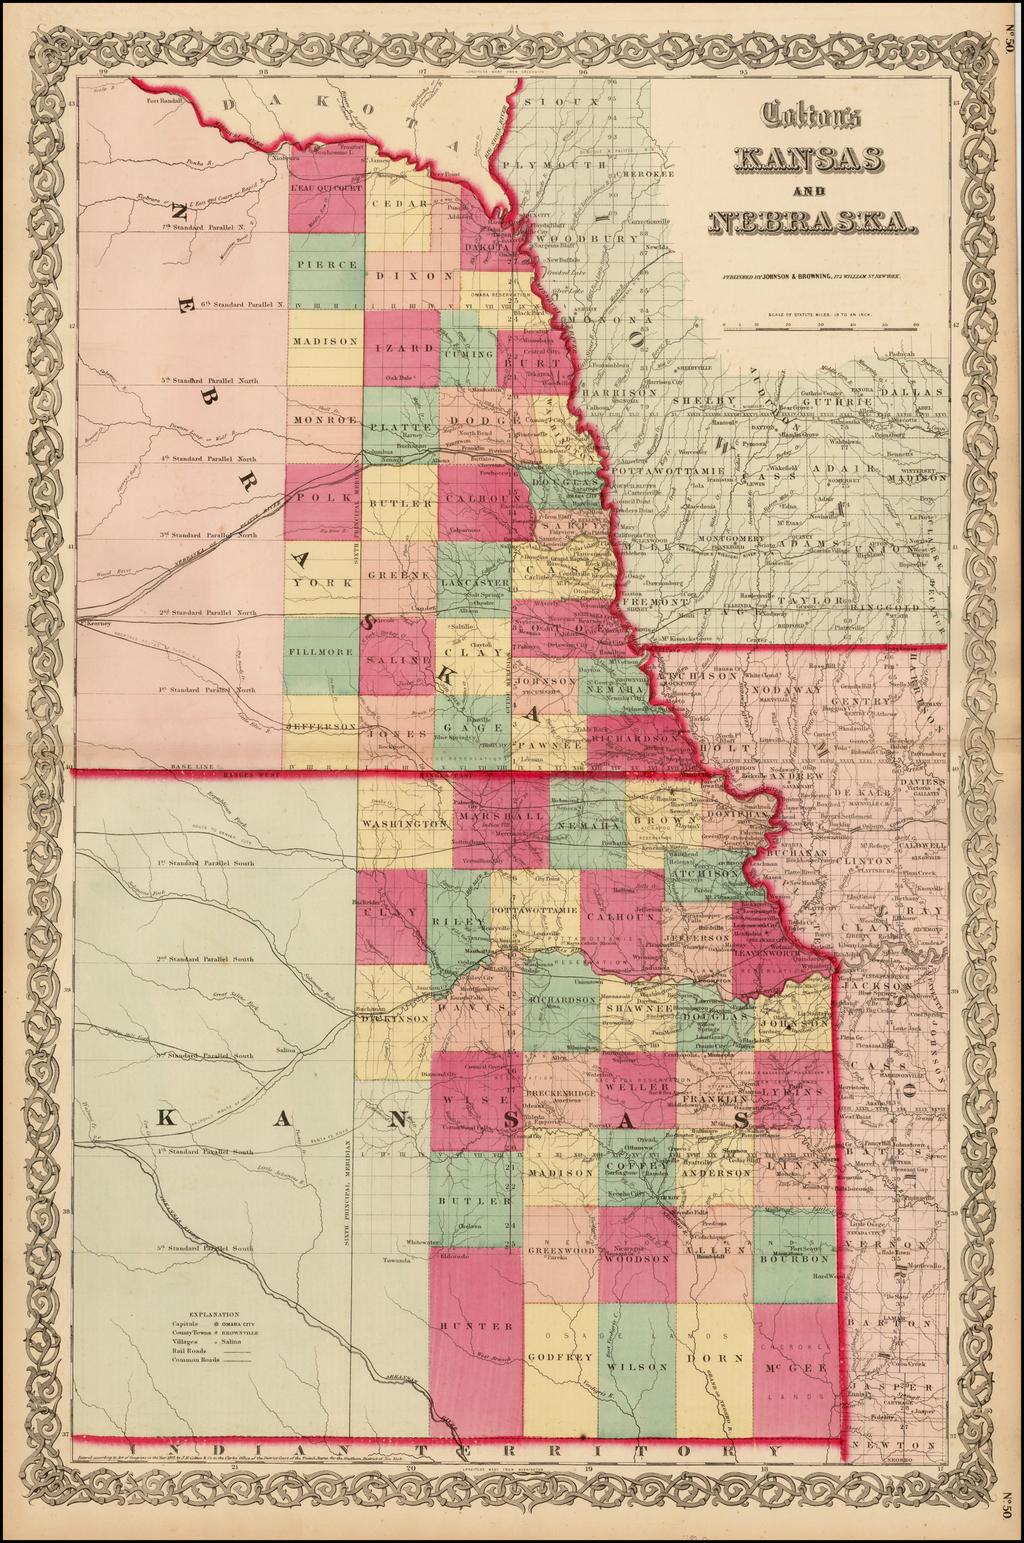 Colton's Kansas and Nebraska By Joseph Hutchins Colton